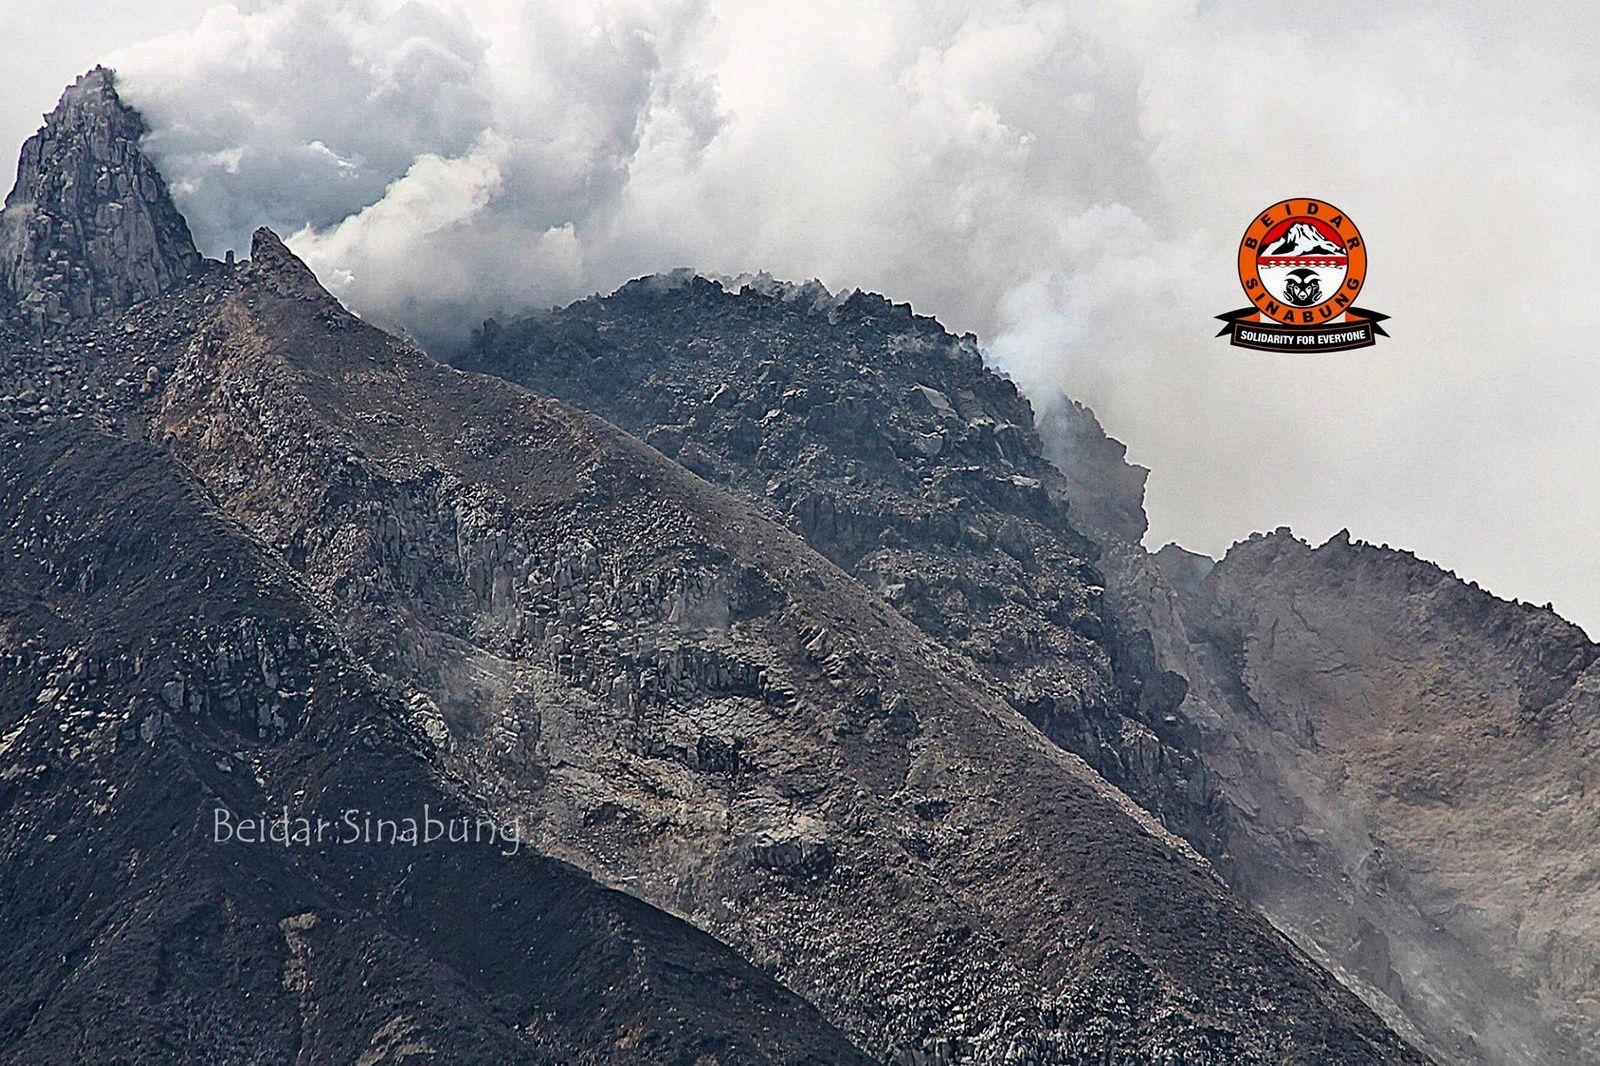 Sinabung - photo la plus récente du dôme sommital le 21.06.2015 - via Beidar Sinabung